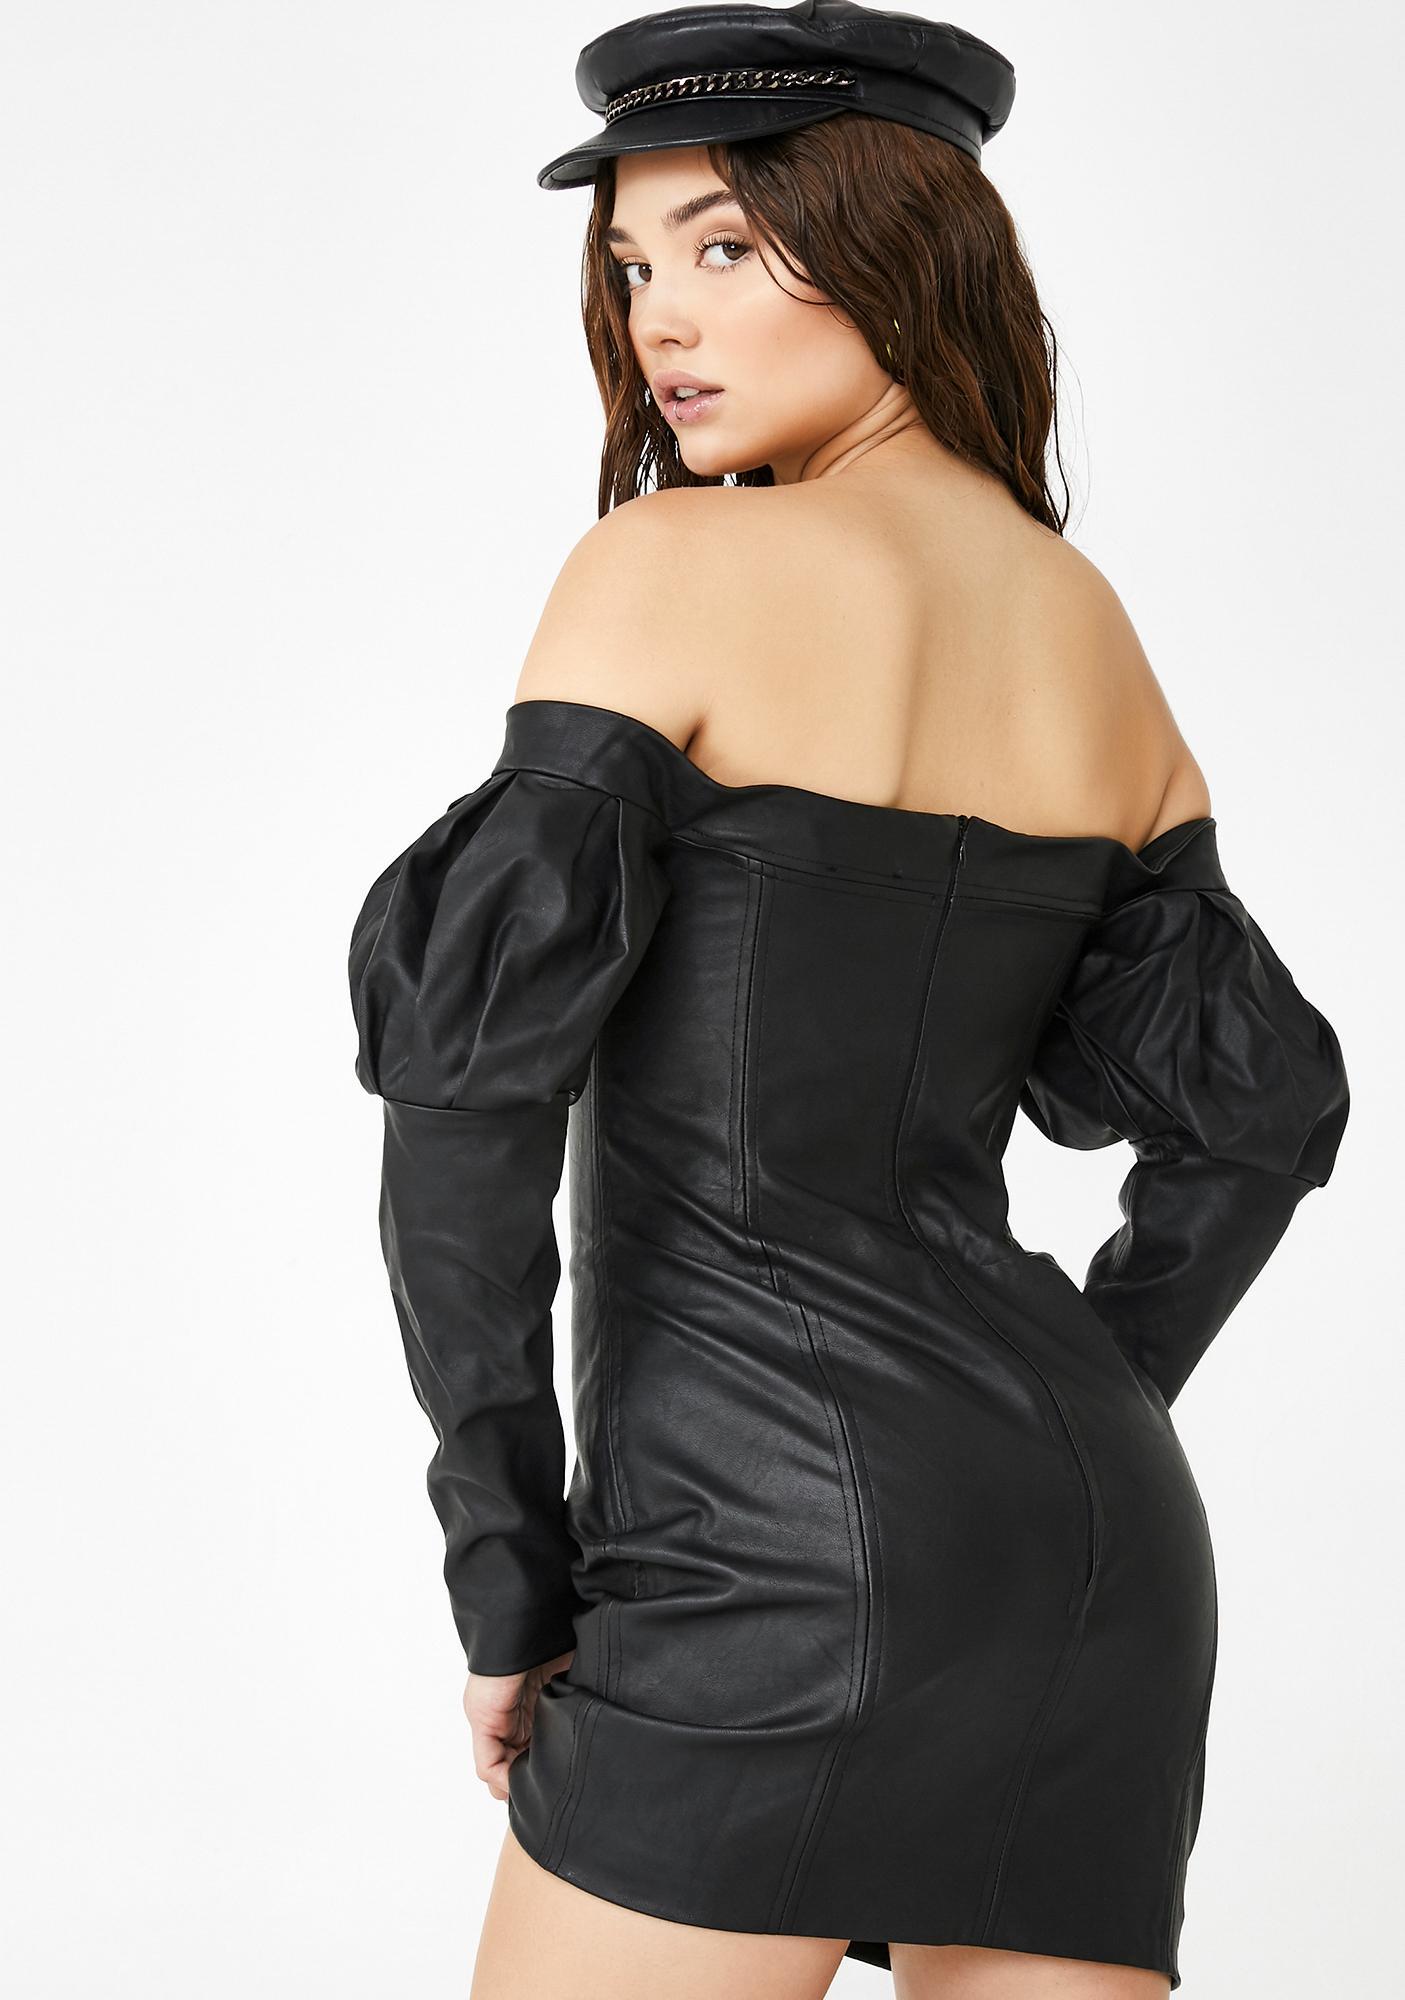 Kiki Riki Can't Touch This Mini Dress